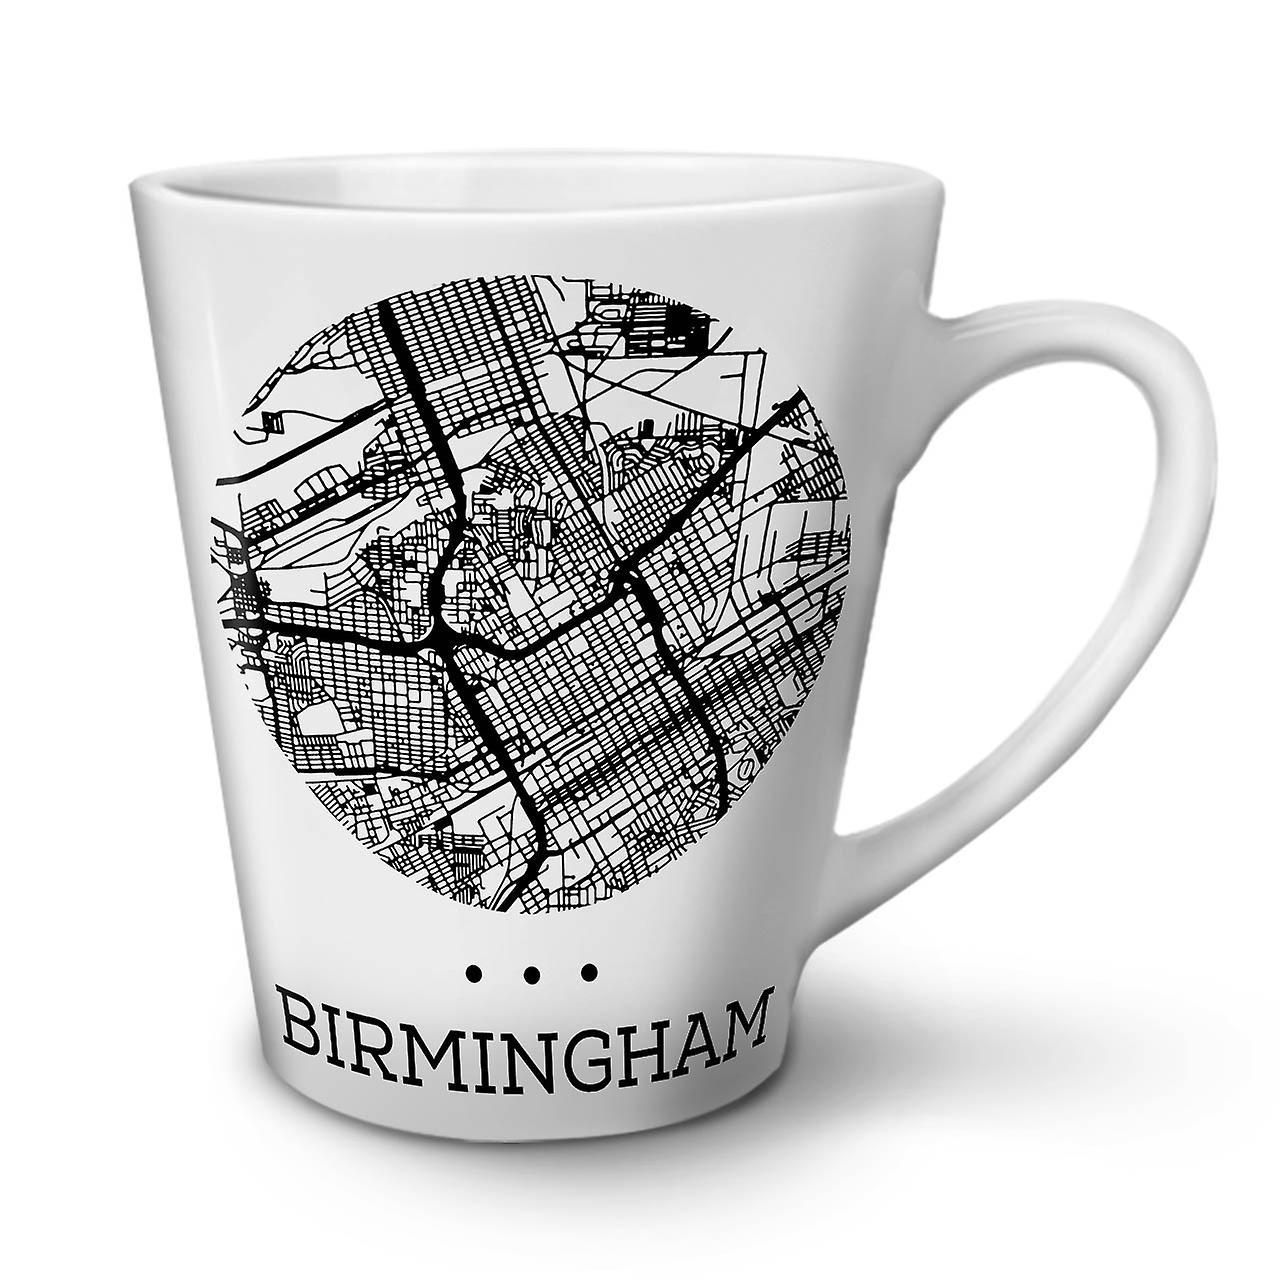 Thé Céramique Mug Latte En Birmingham Nouveau Carte 12 Blanc Café Mode De OzWellcoda Tlc1JKF3